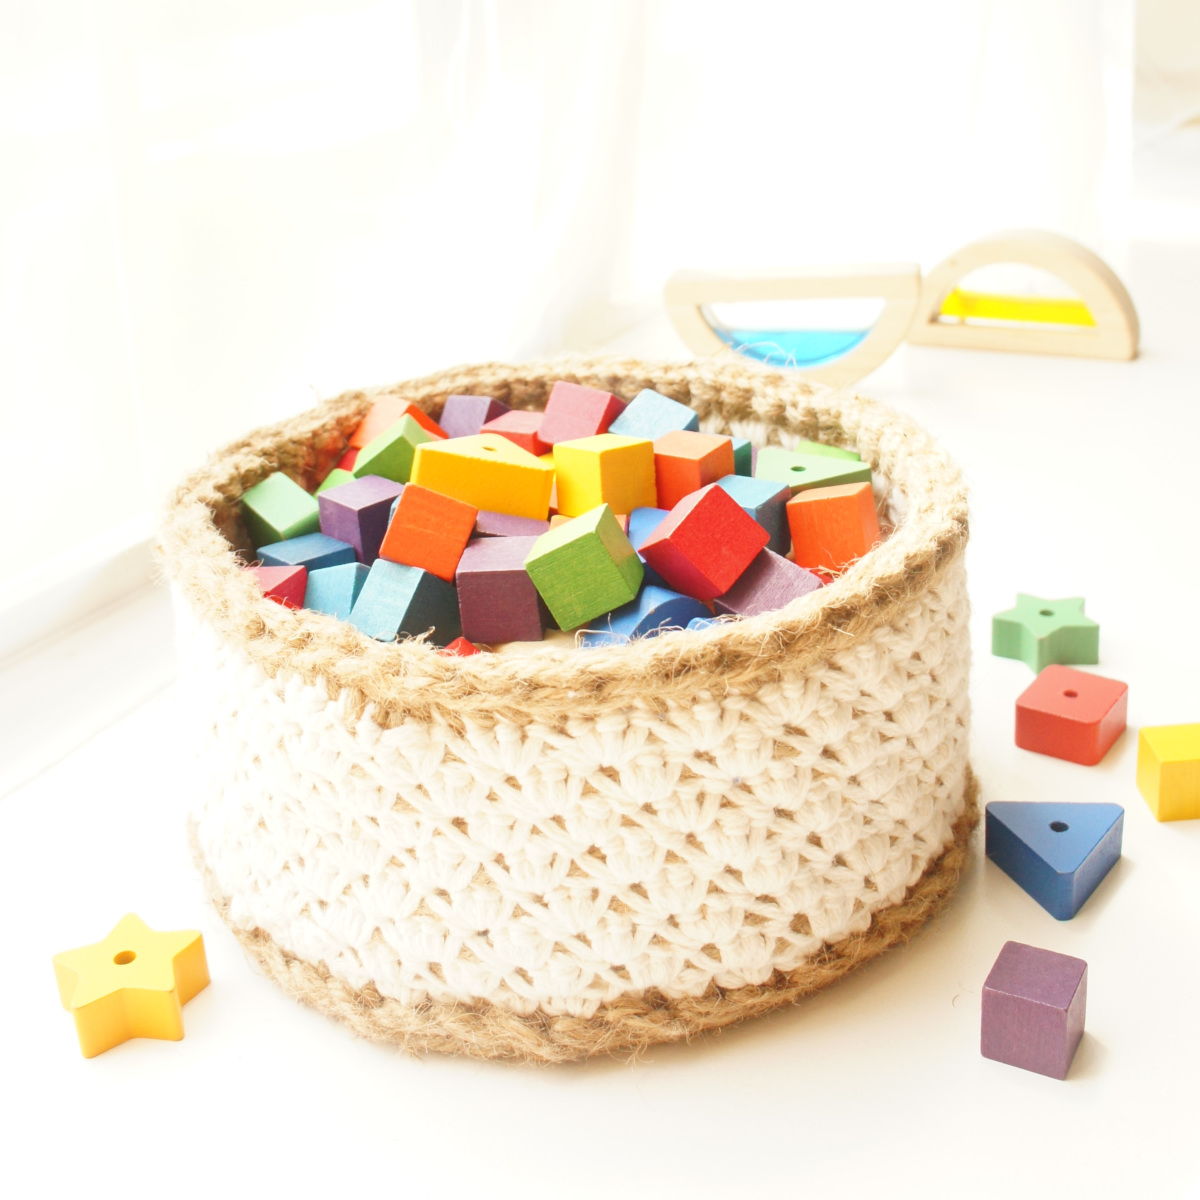 Lacey Jute and Cotton Baskets | | jakigu.com crochet pattern